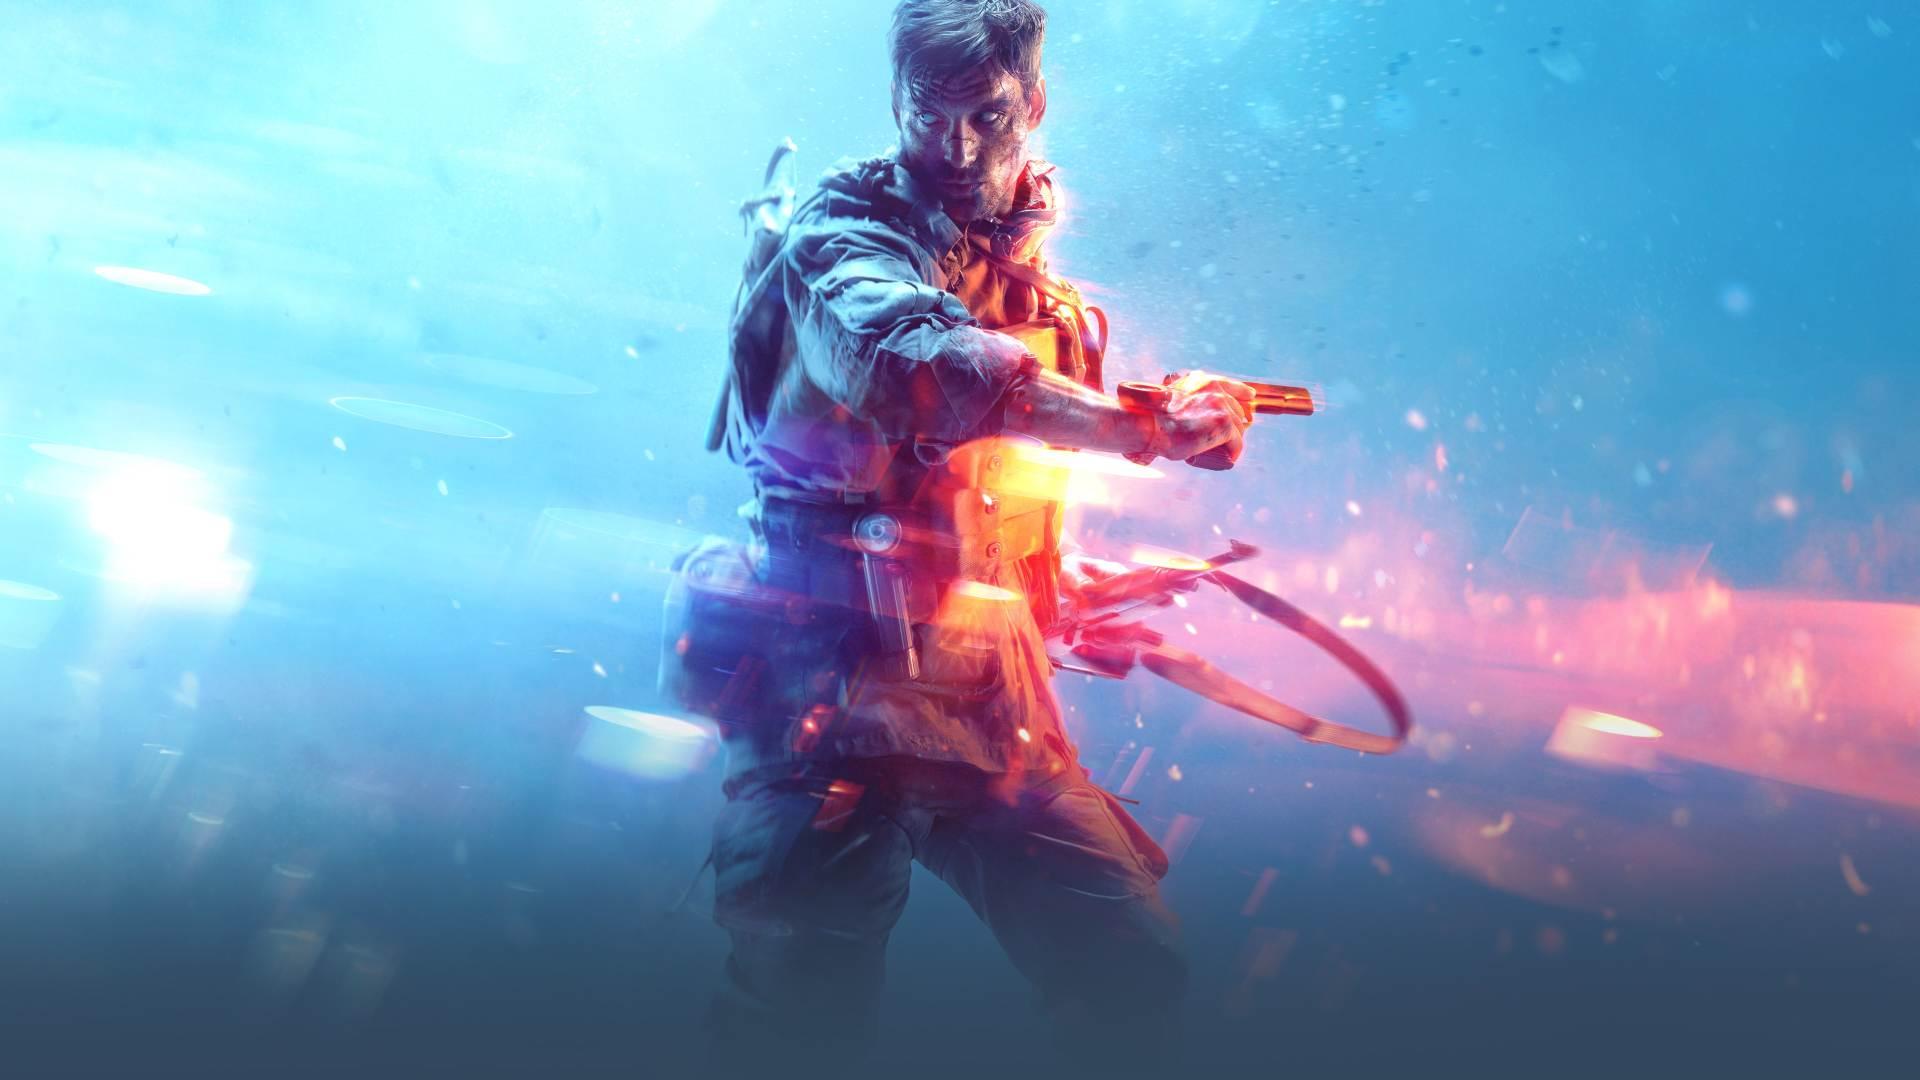 EA teases something soon in June for Battlefield screenshot